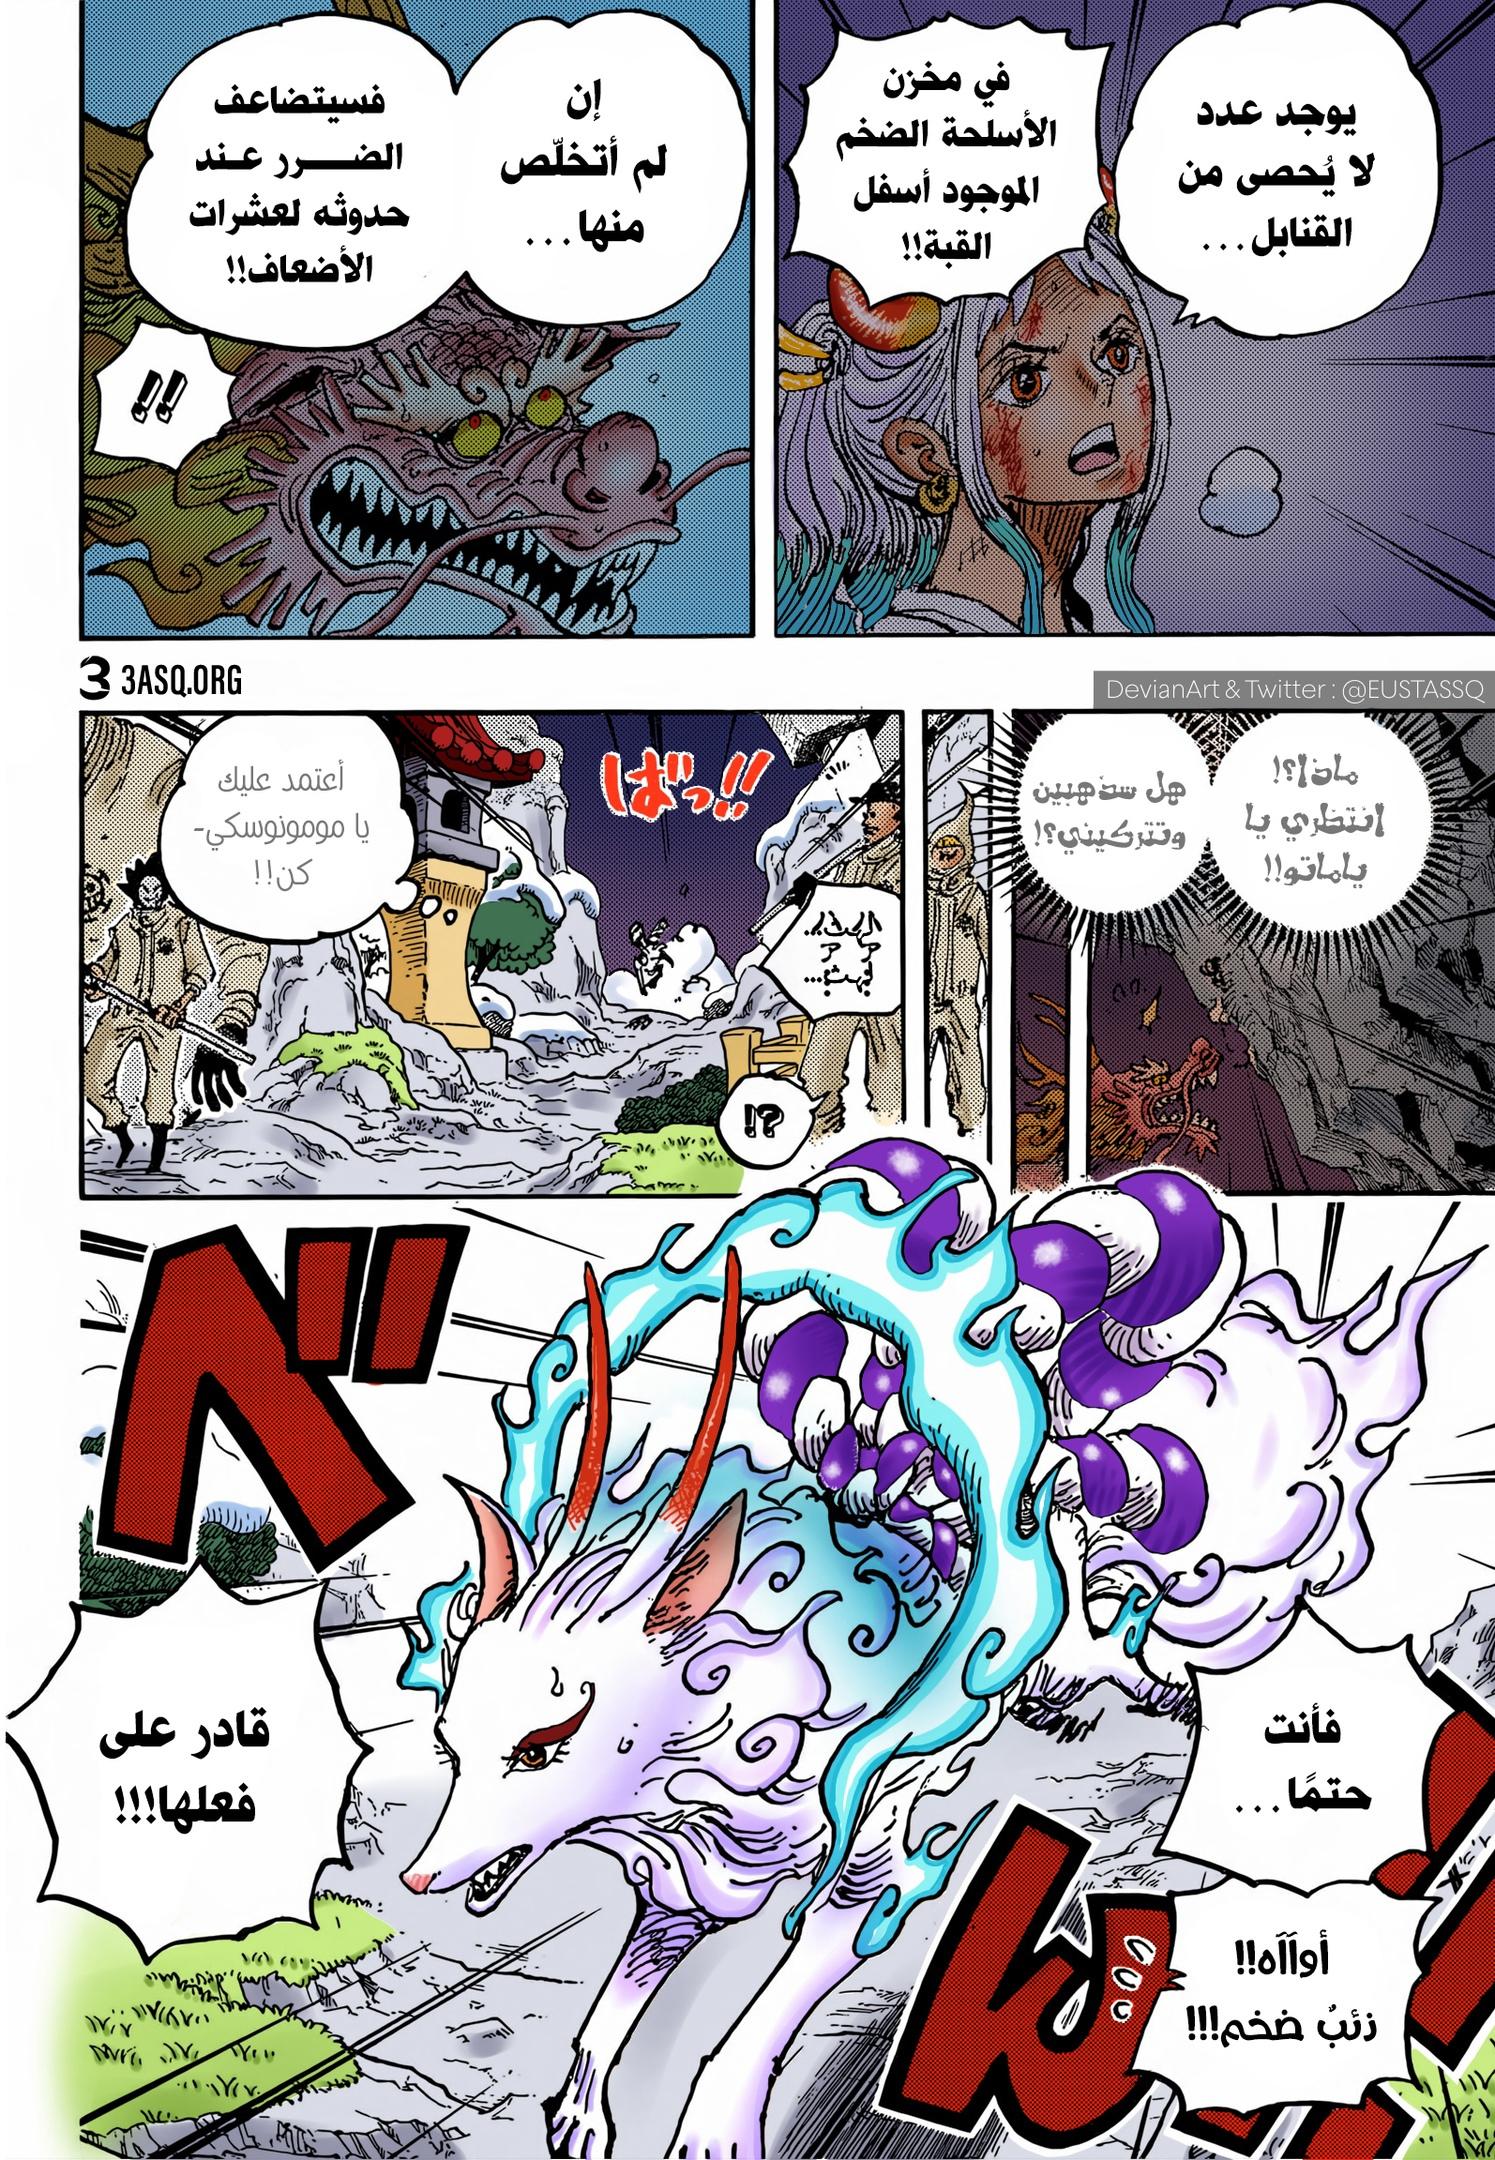 Arab One Piece 1028, image №21